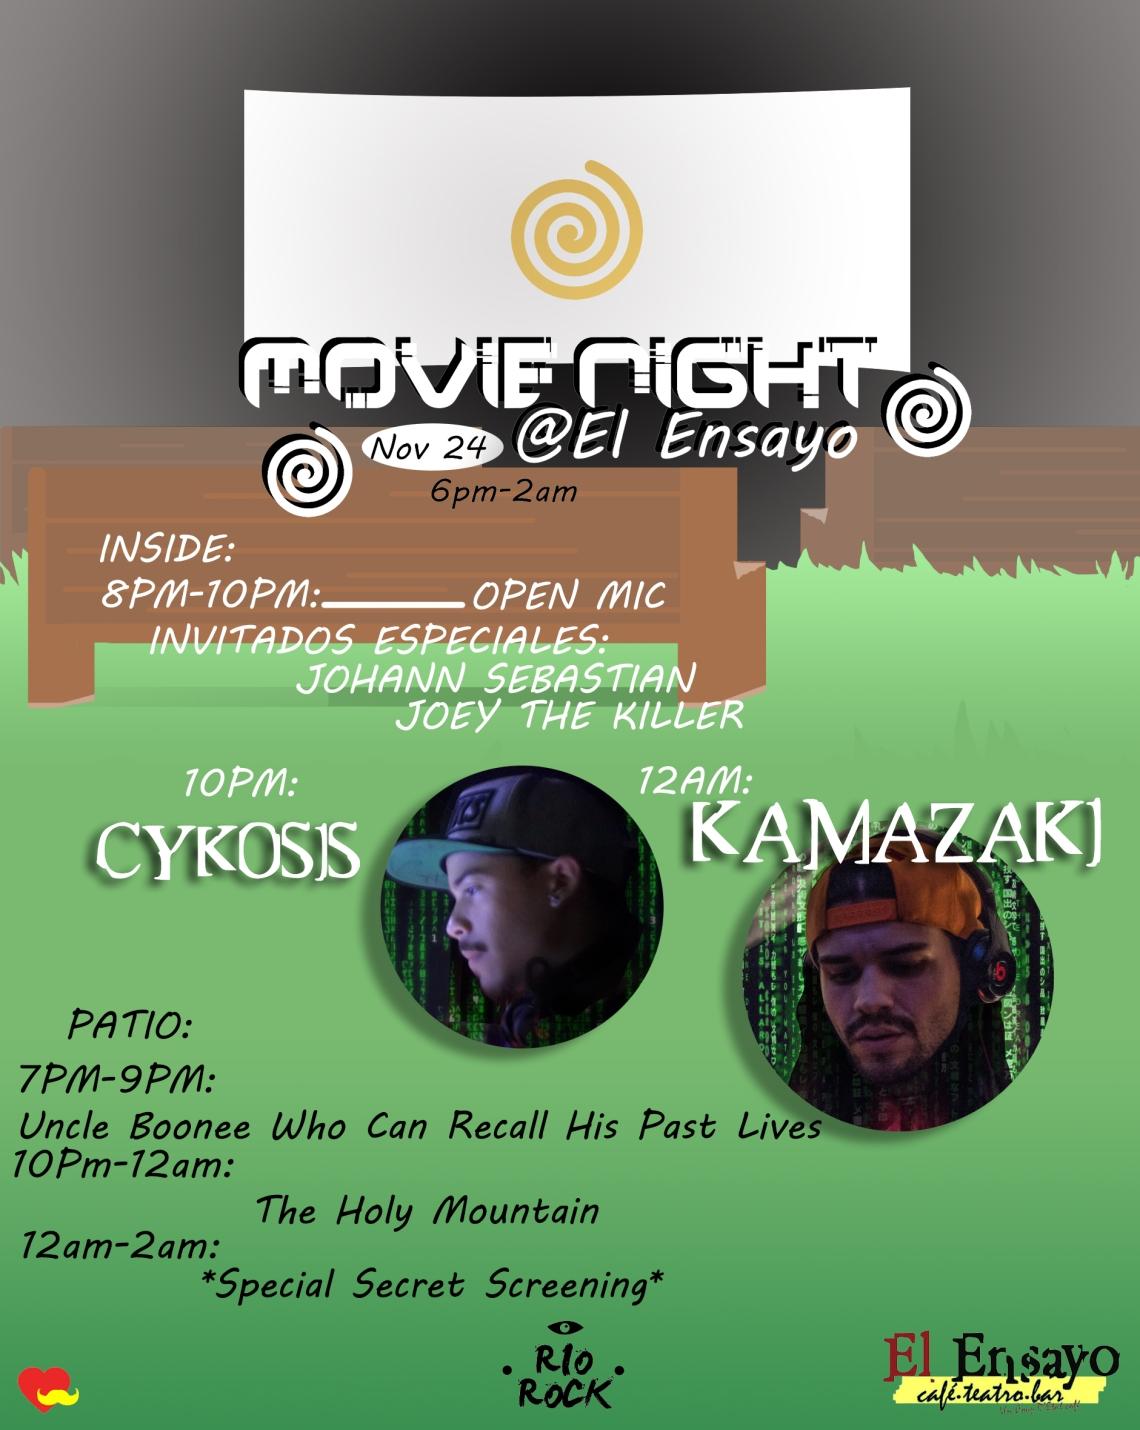 flyer promo.jpg